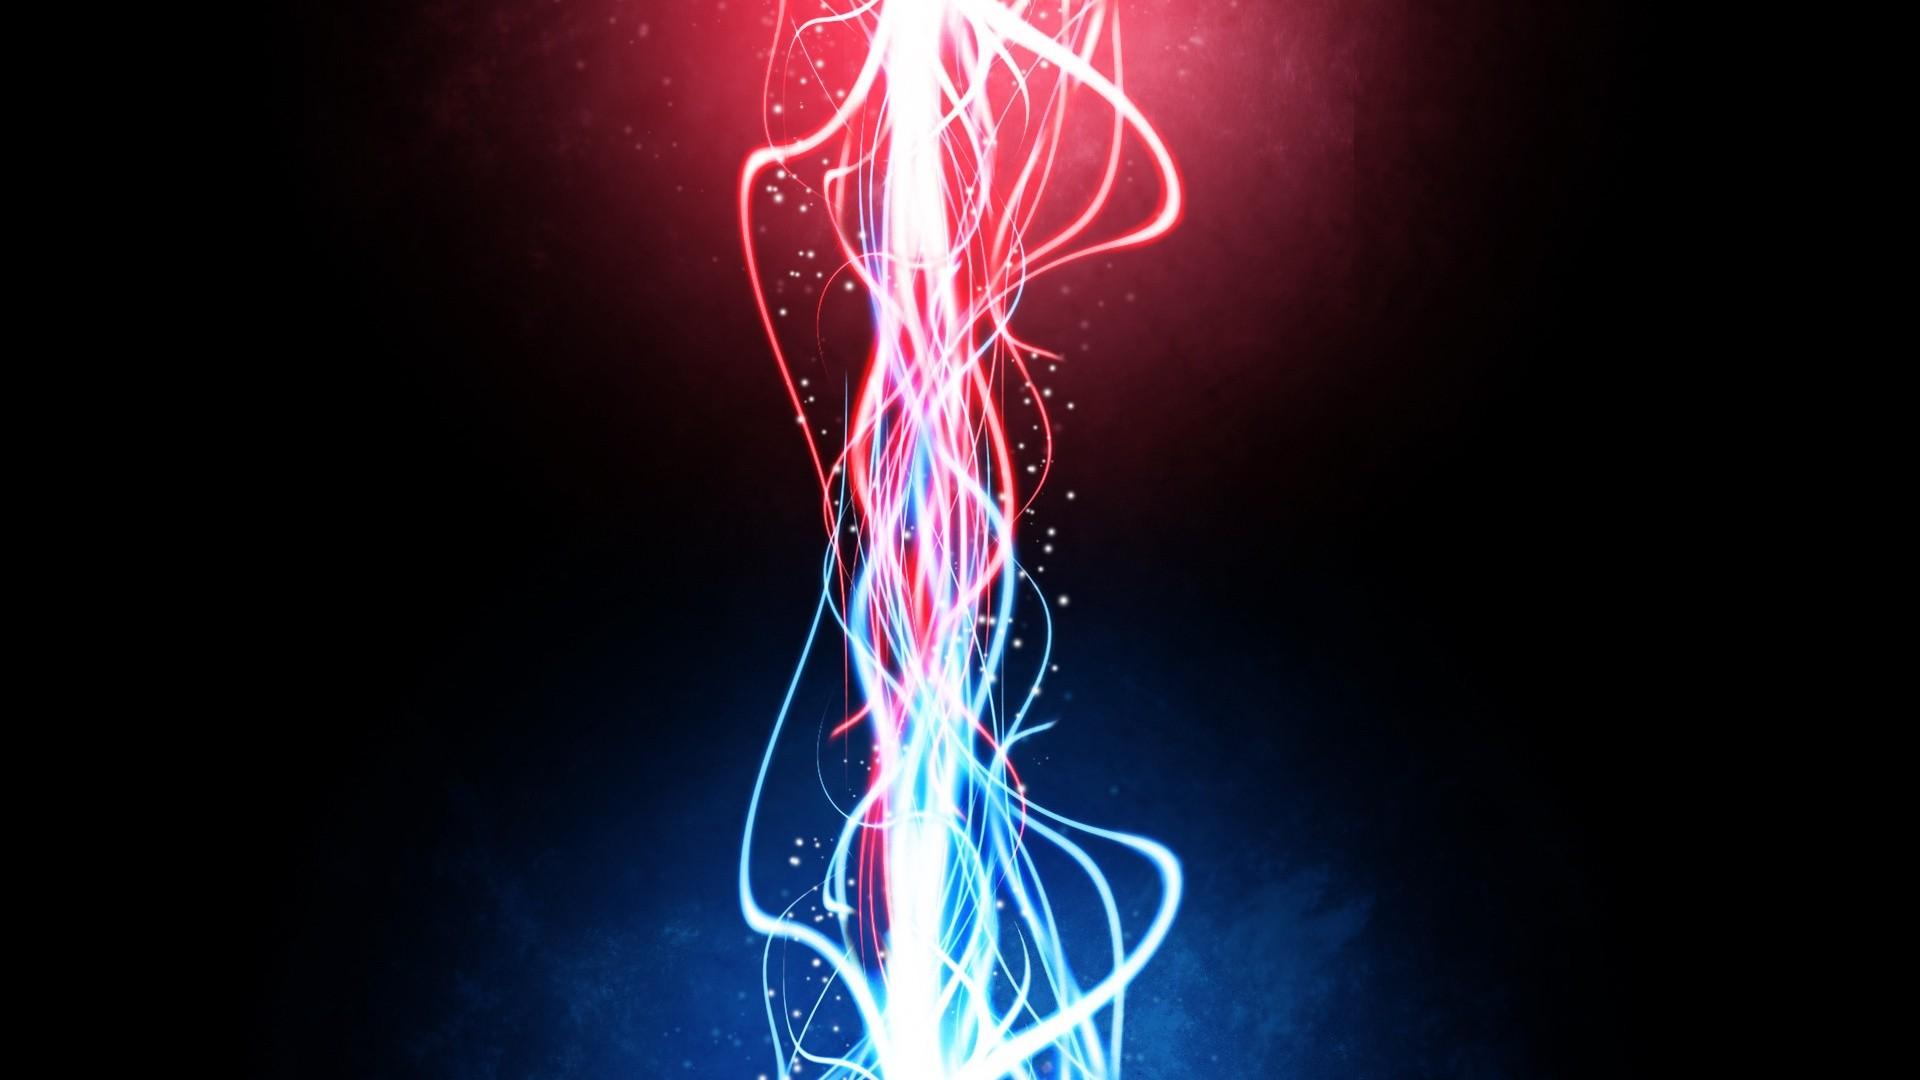 Electric Image